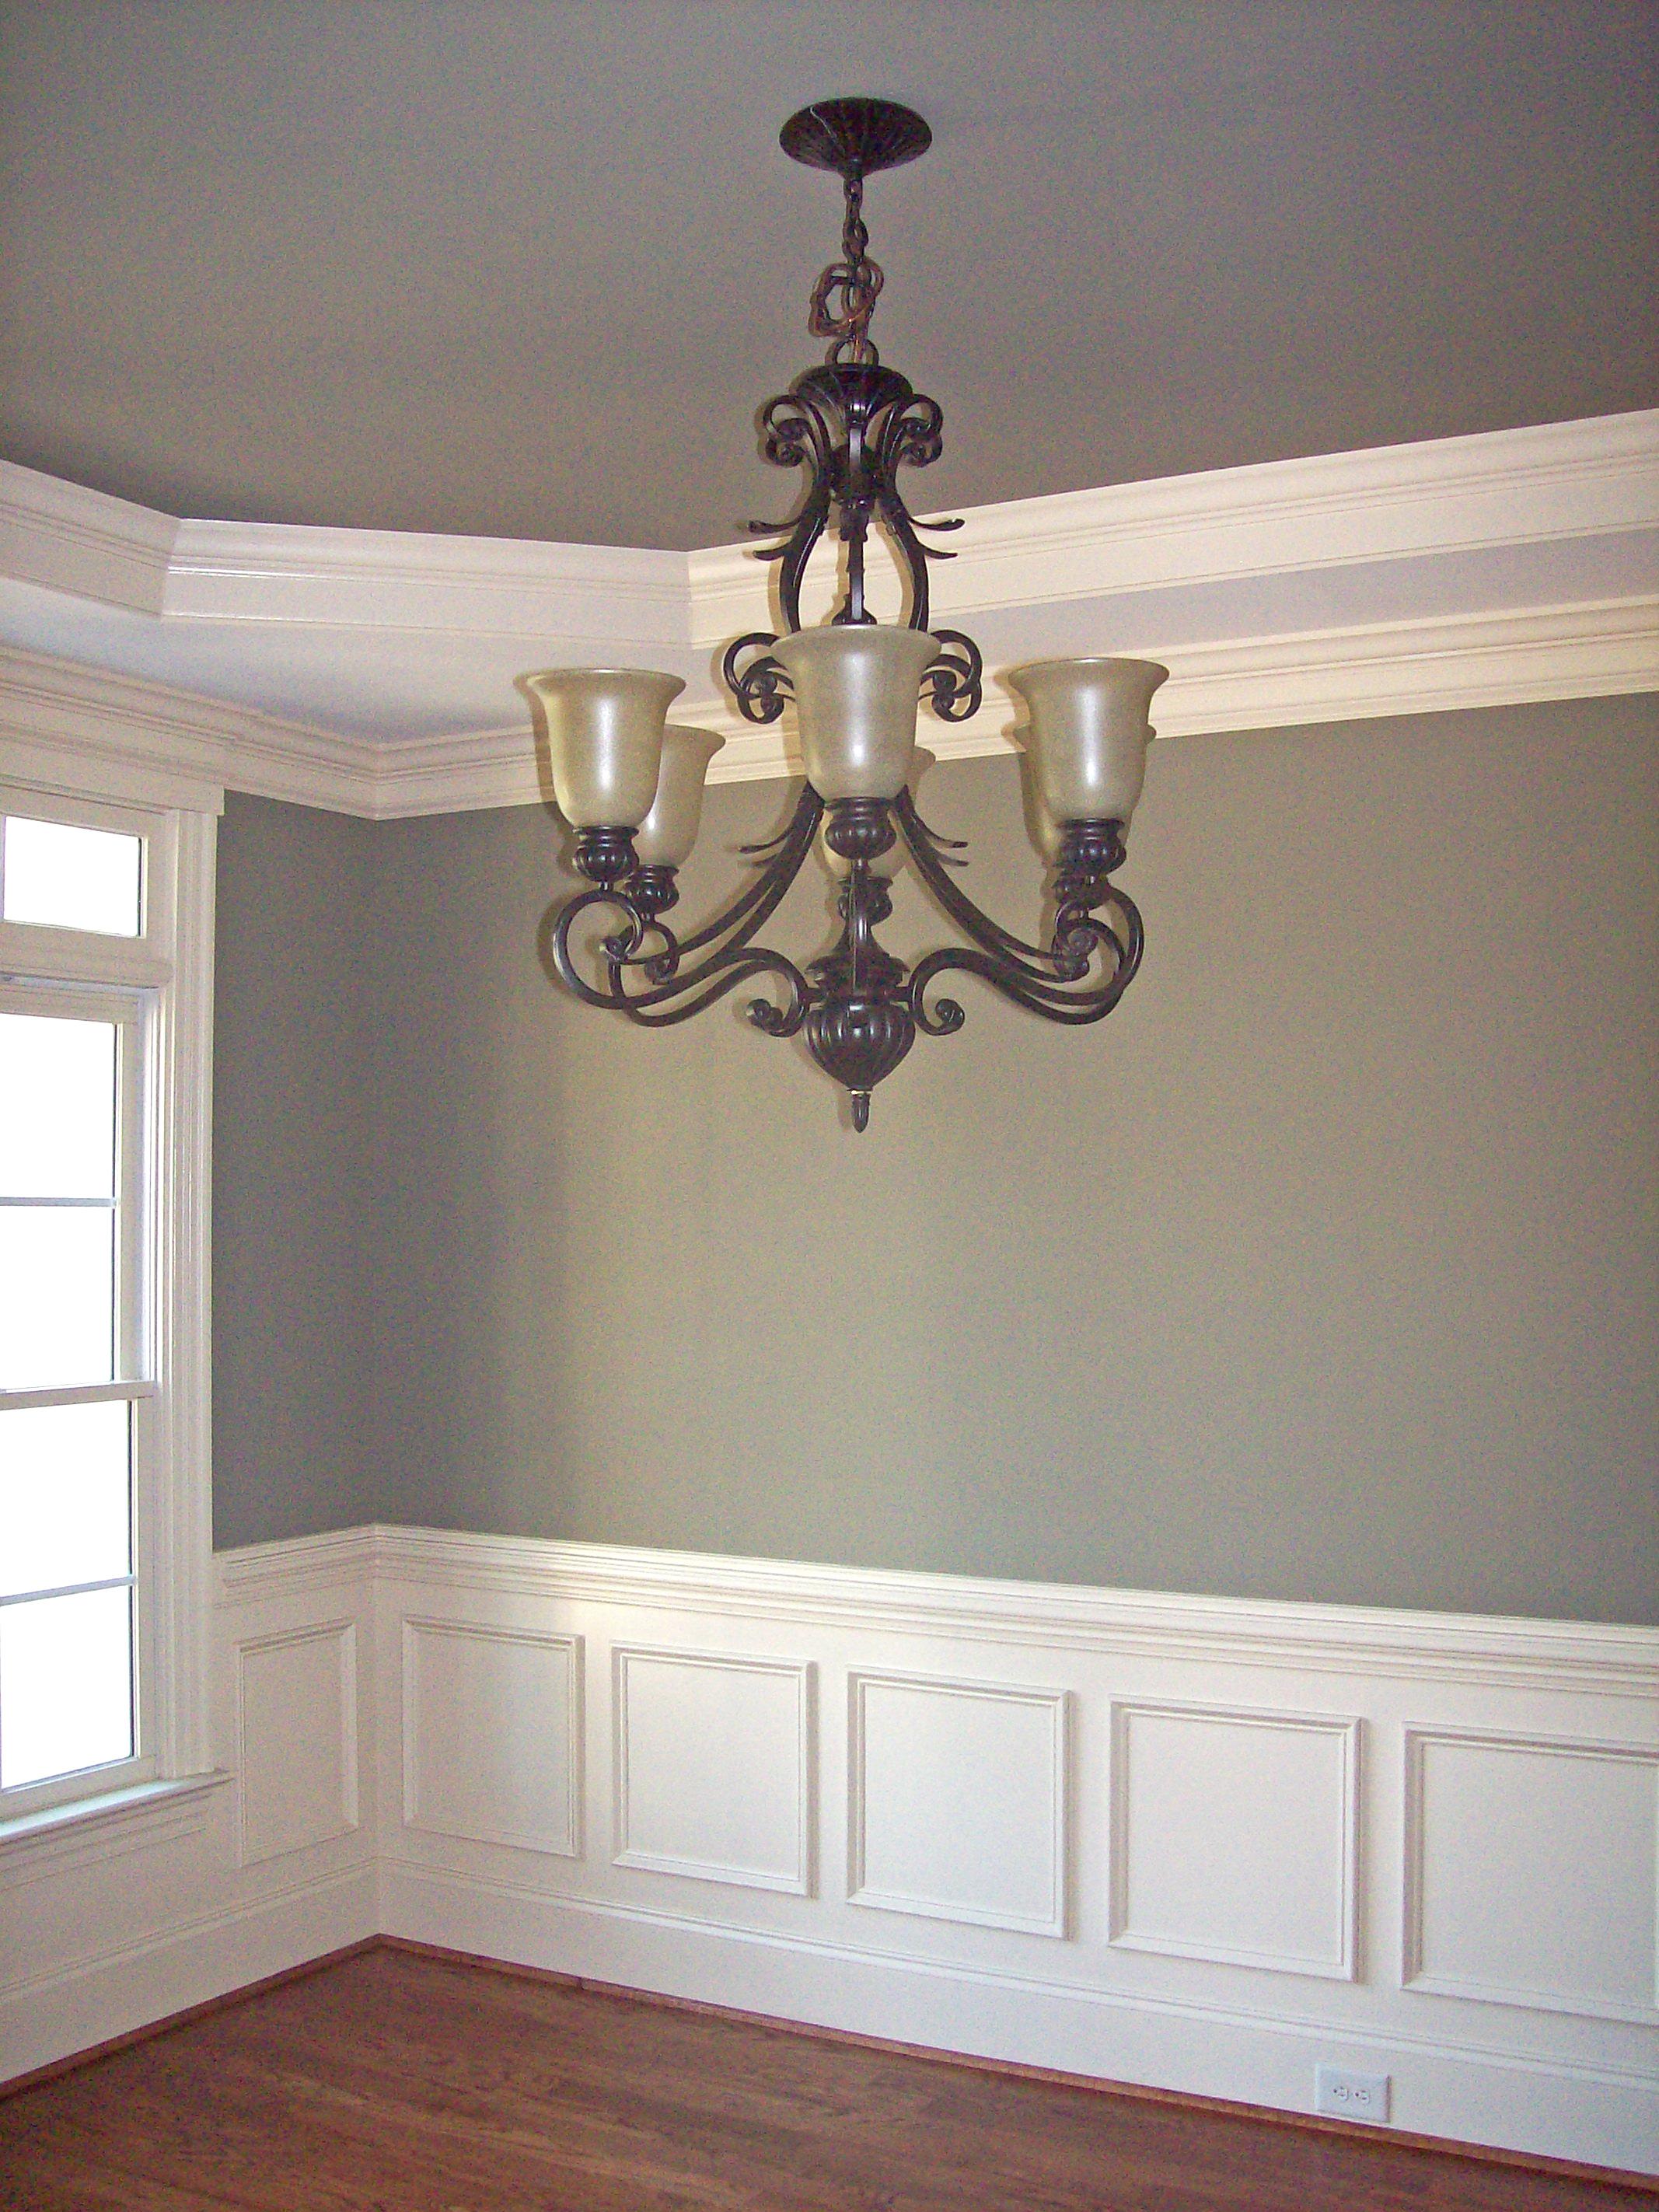 Applied Panels - Trey Ceiling.jpg